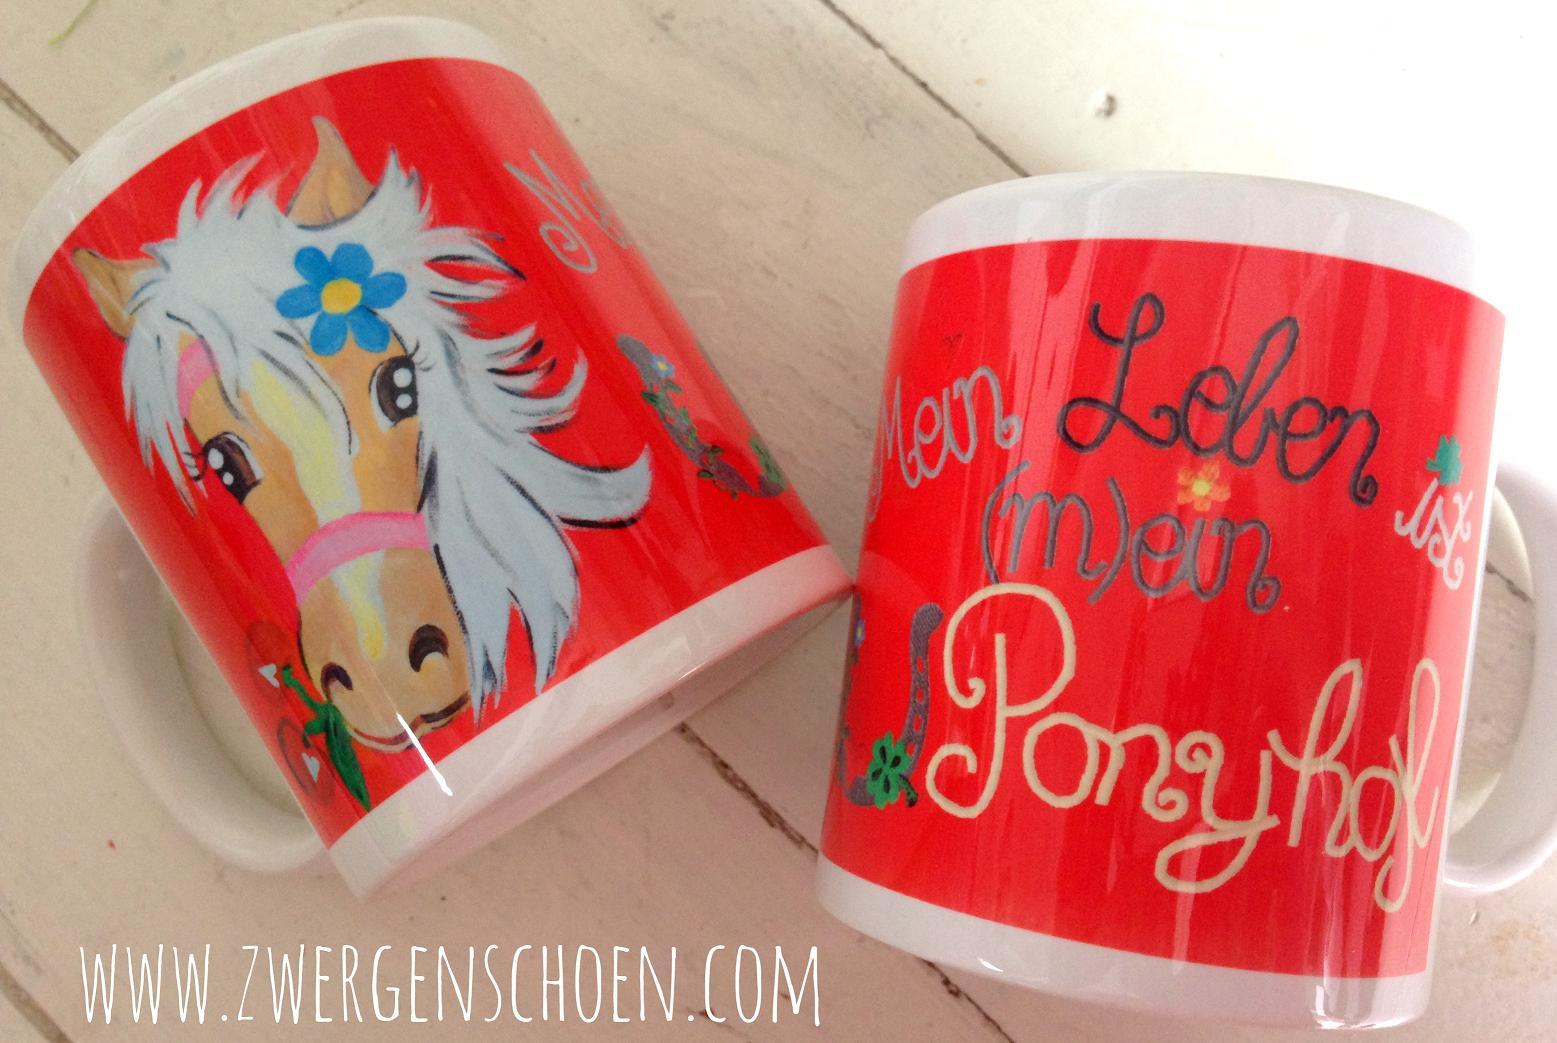 ♥MON CHÈRI♥ Tasse LIEBLINGS Pferd 0.3L